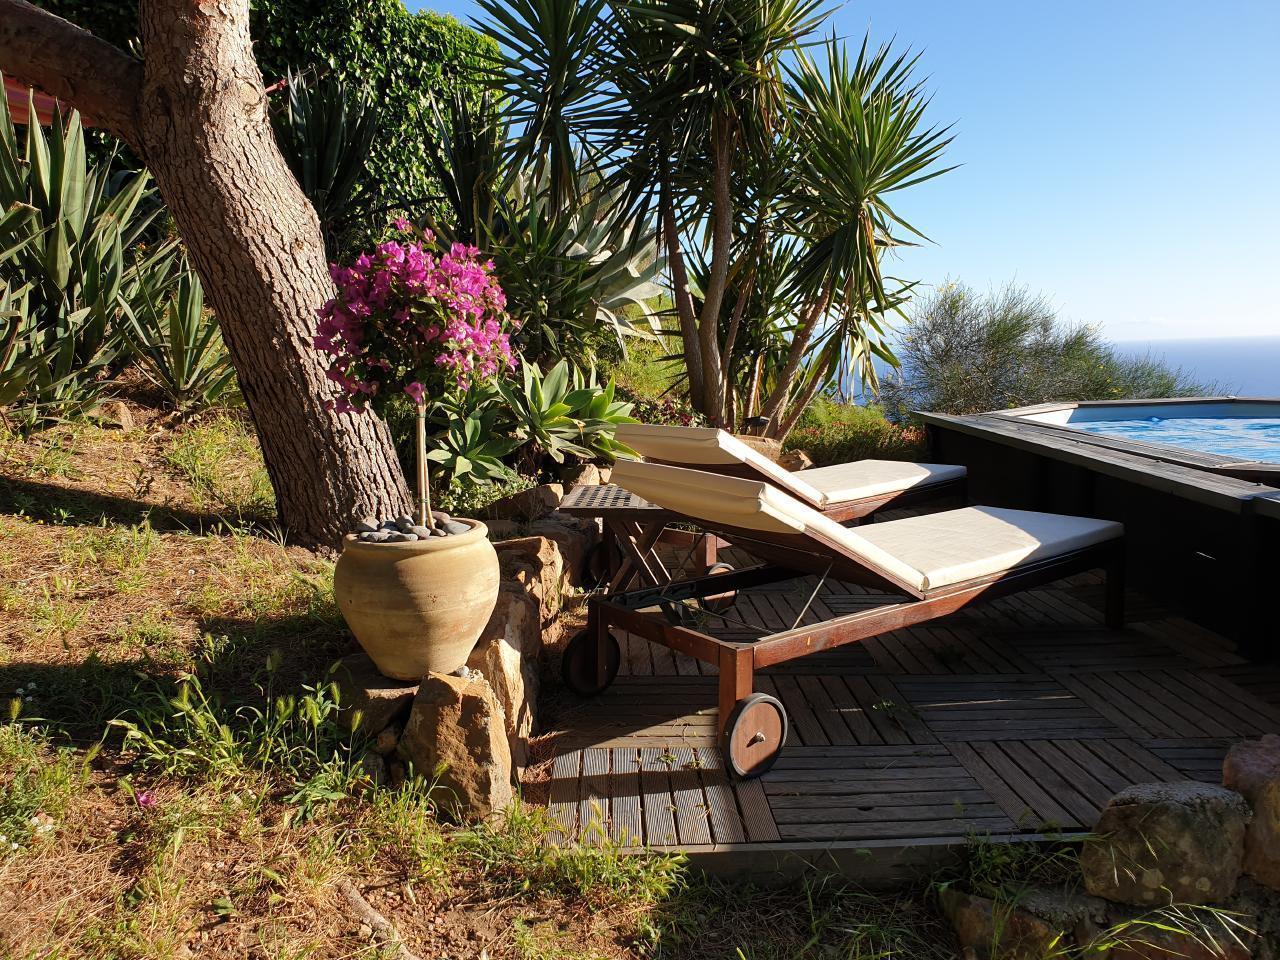 Maison de vacances Casetta Eoliana Lipari Inseln, pool, sauna. (827872), Lipari, Lipari, Sicile, Italie, image 29